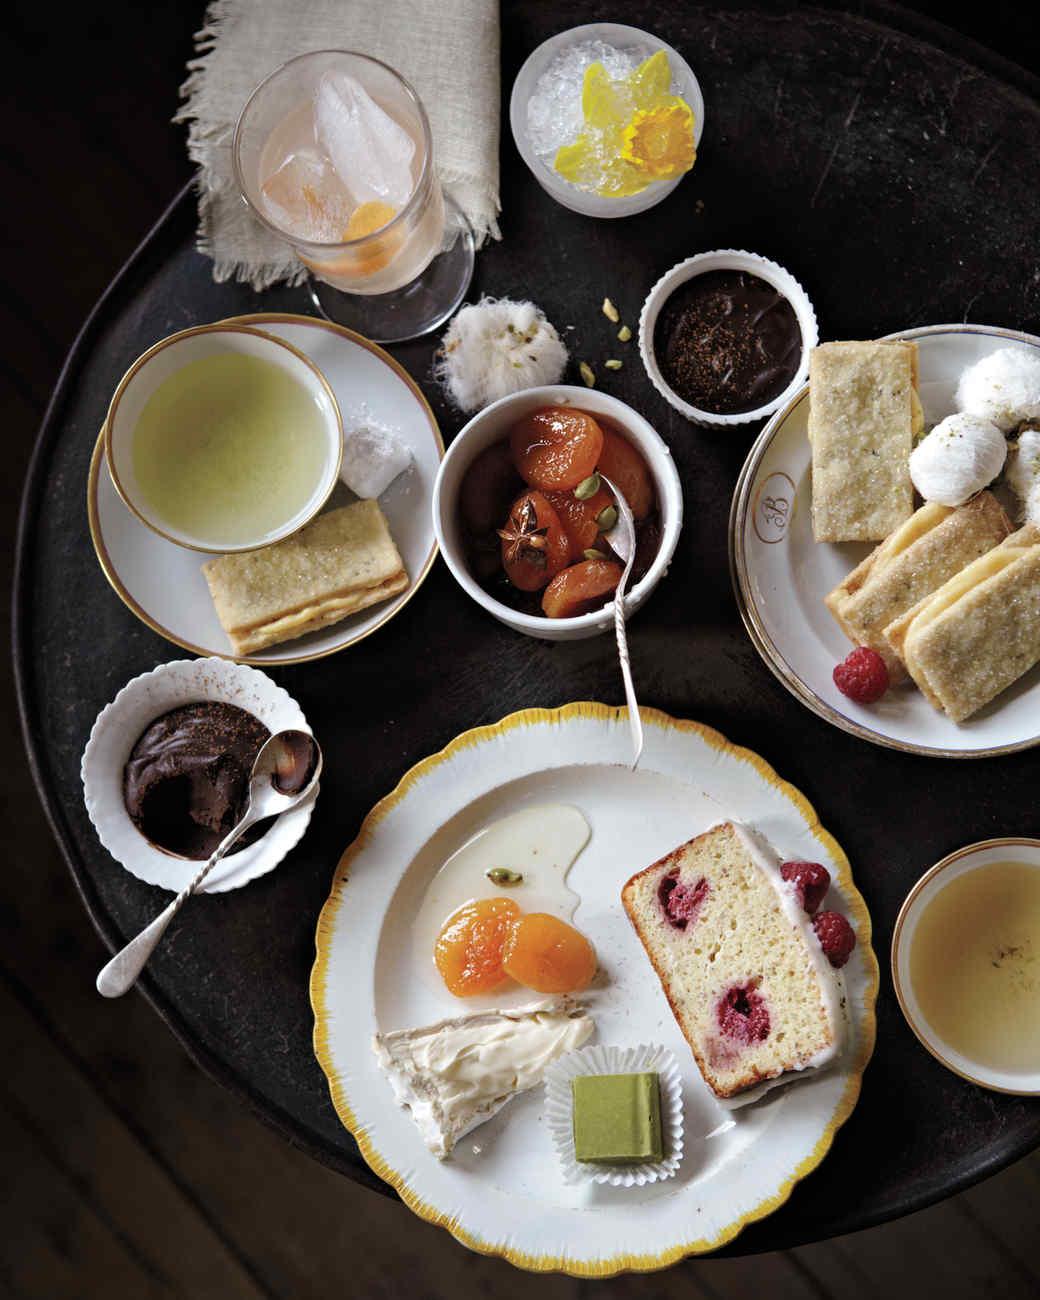 bellocq-tea-snacks-2-mld108270.jpg